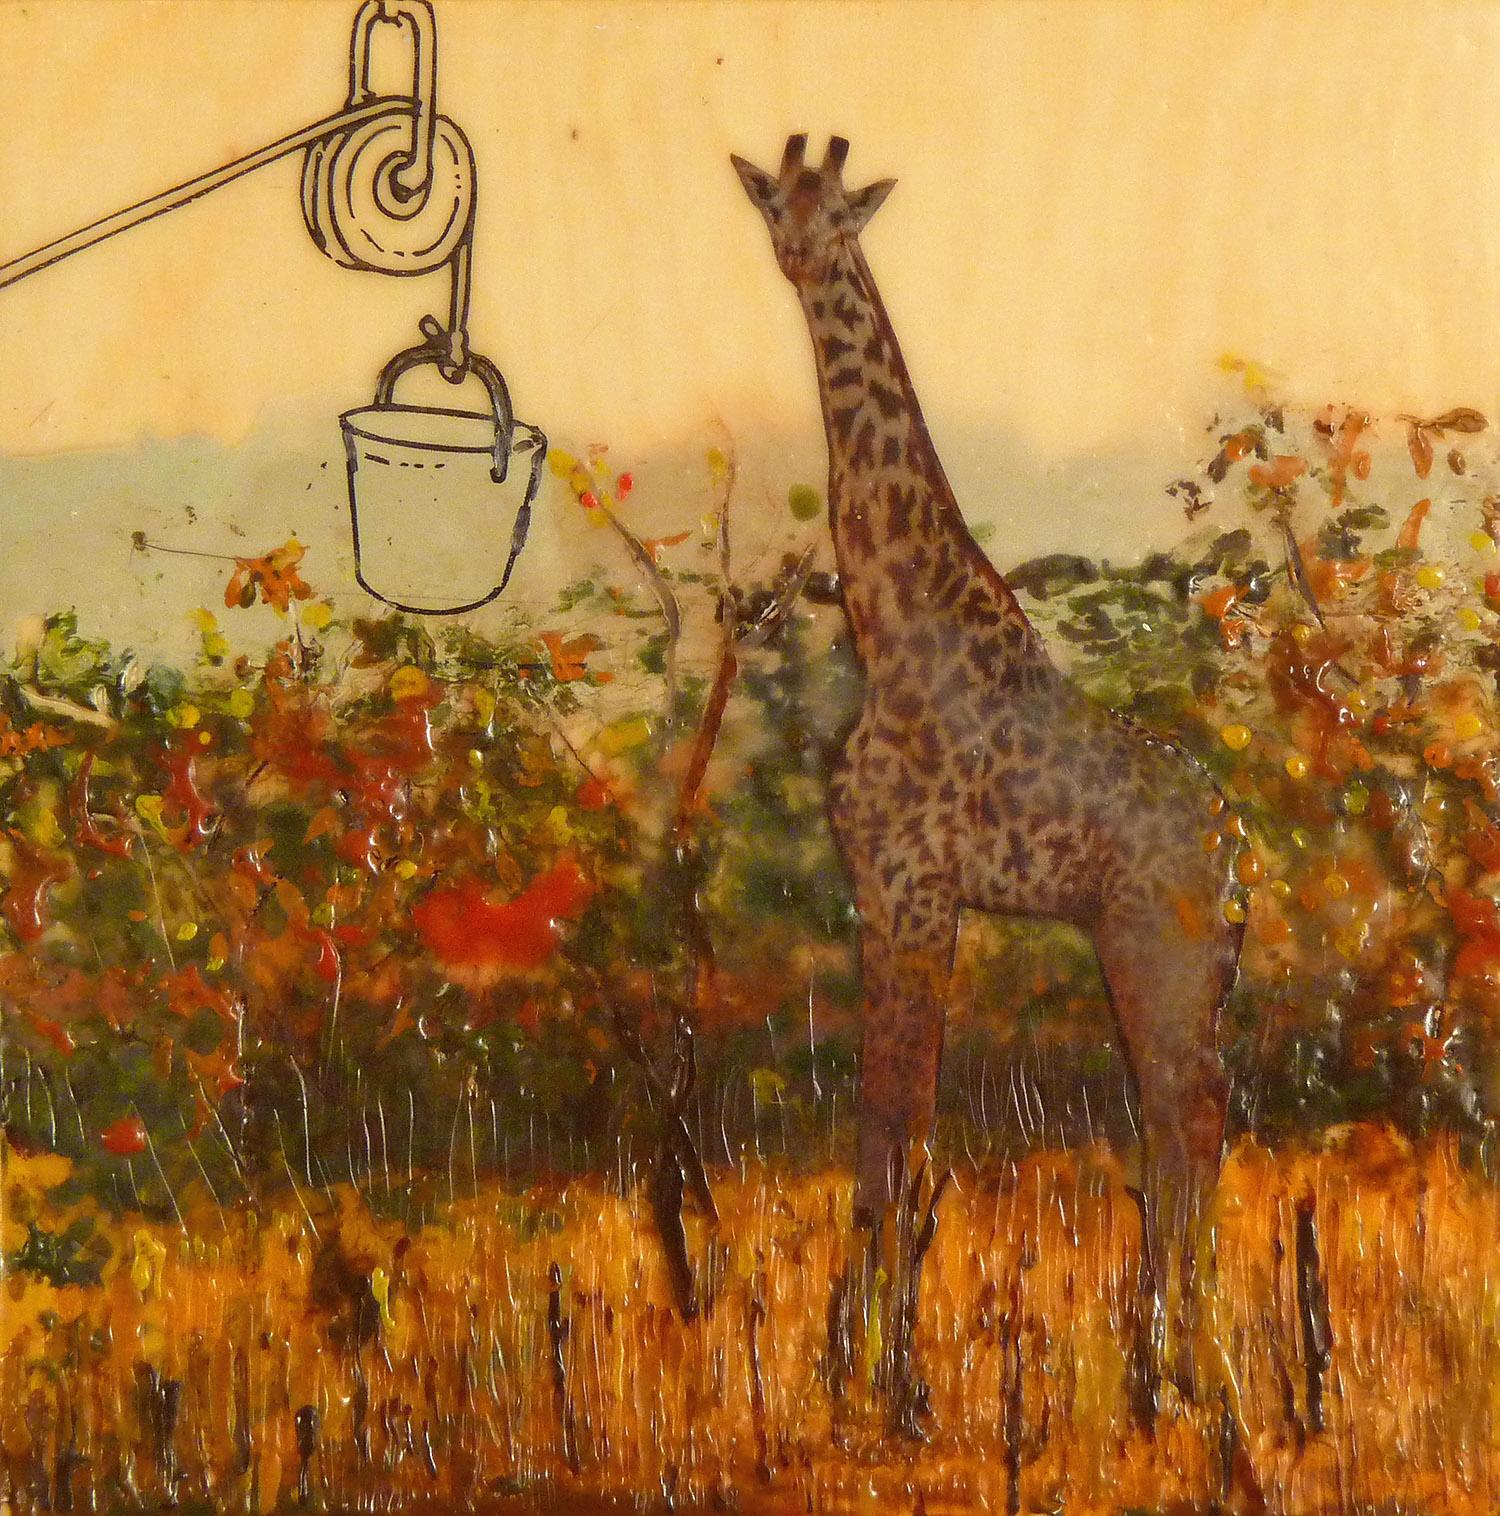 feed the giraffe